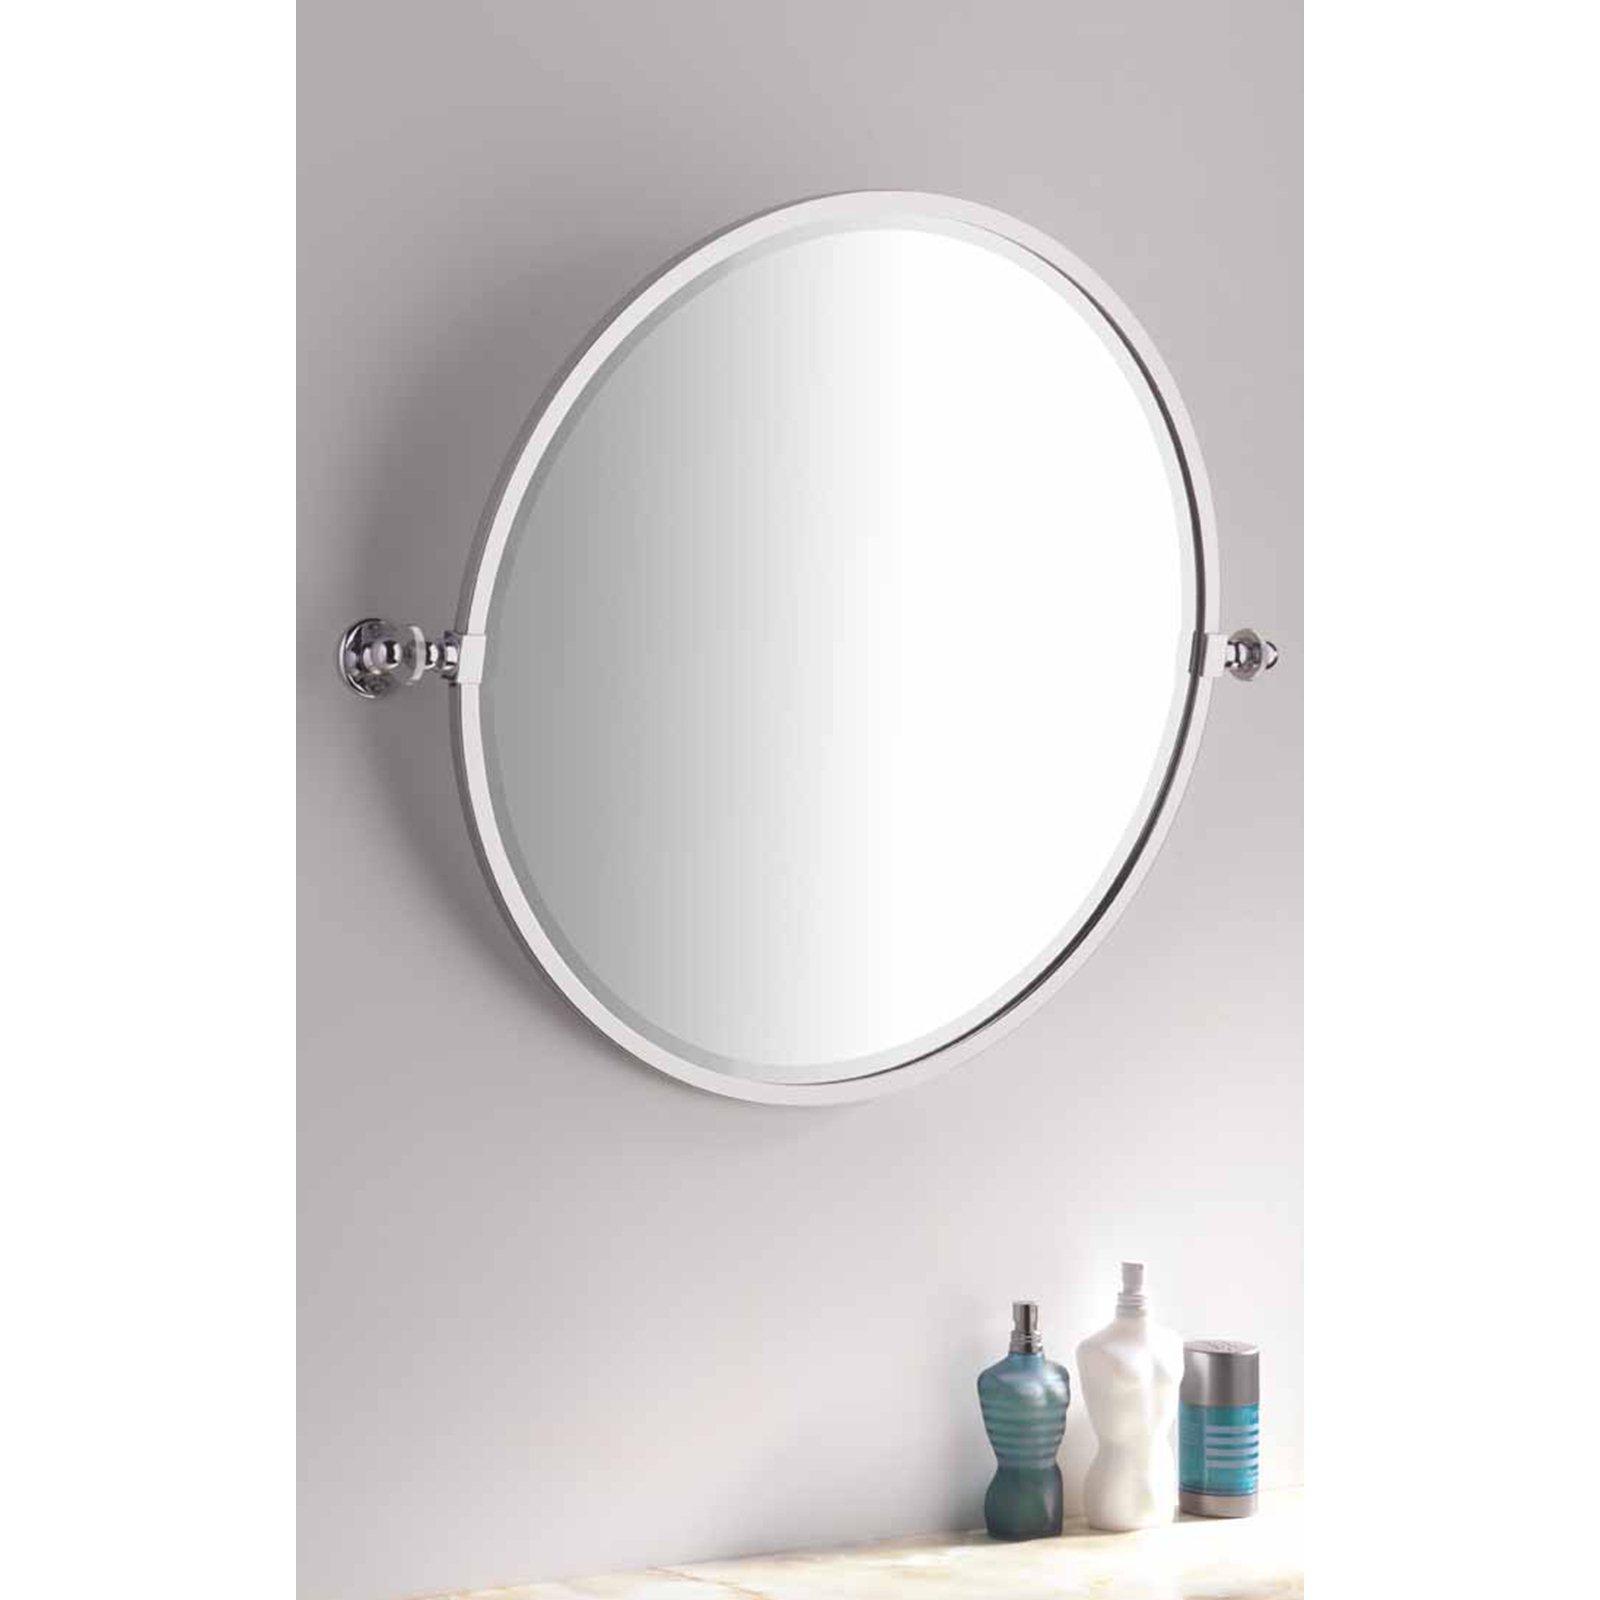 Bathroom Handmade Round Tilting Mirror